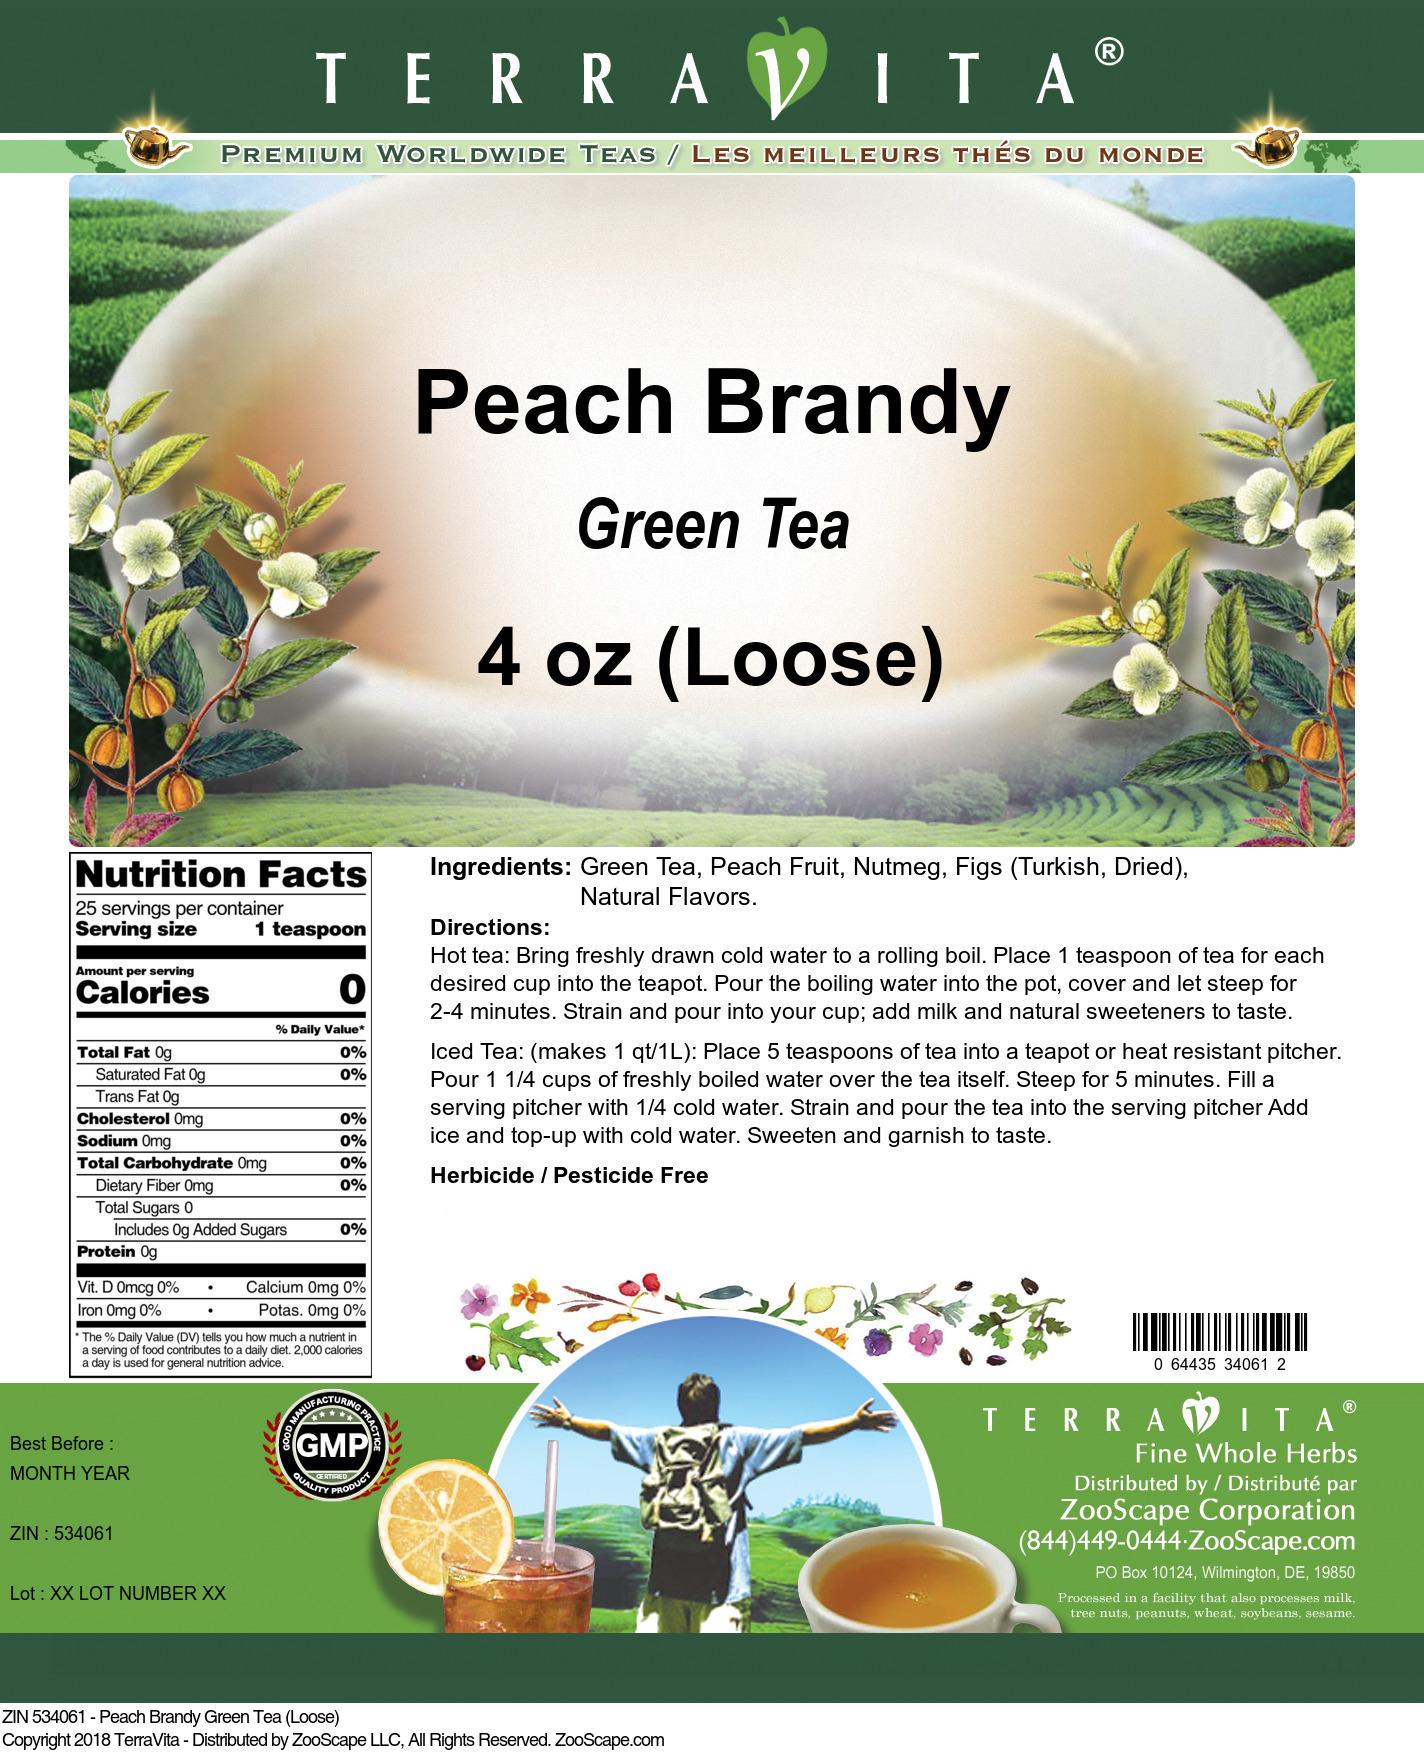 Peach Brandy Green Tea (Loose)